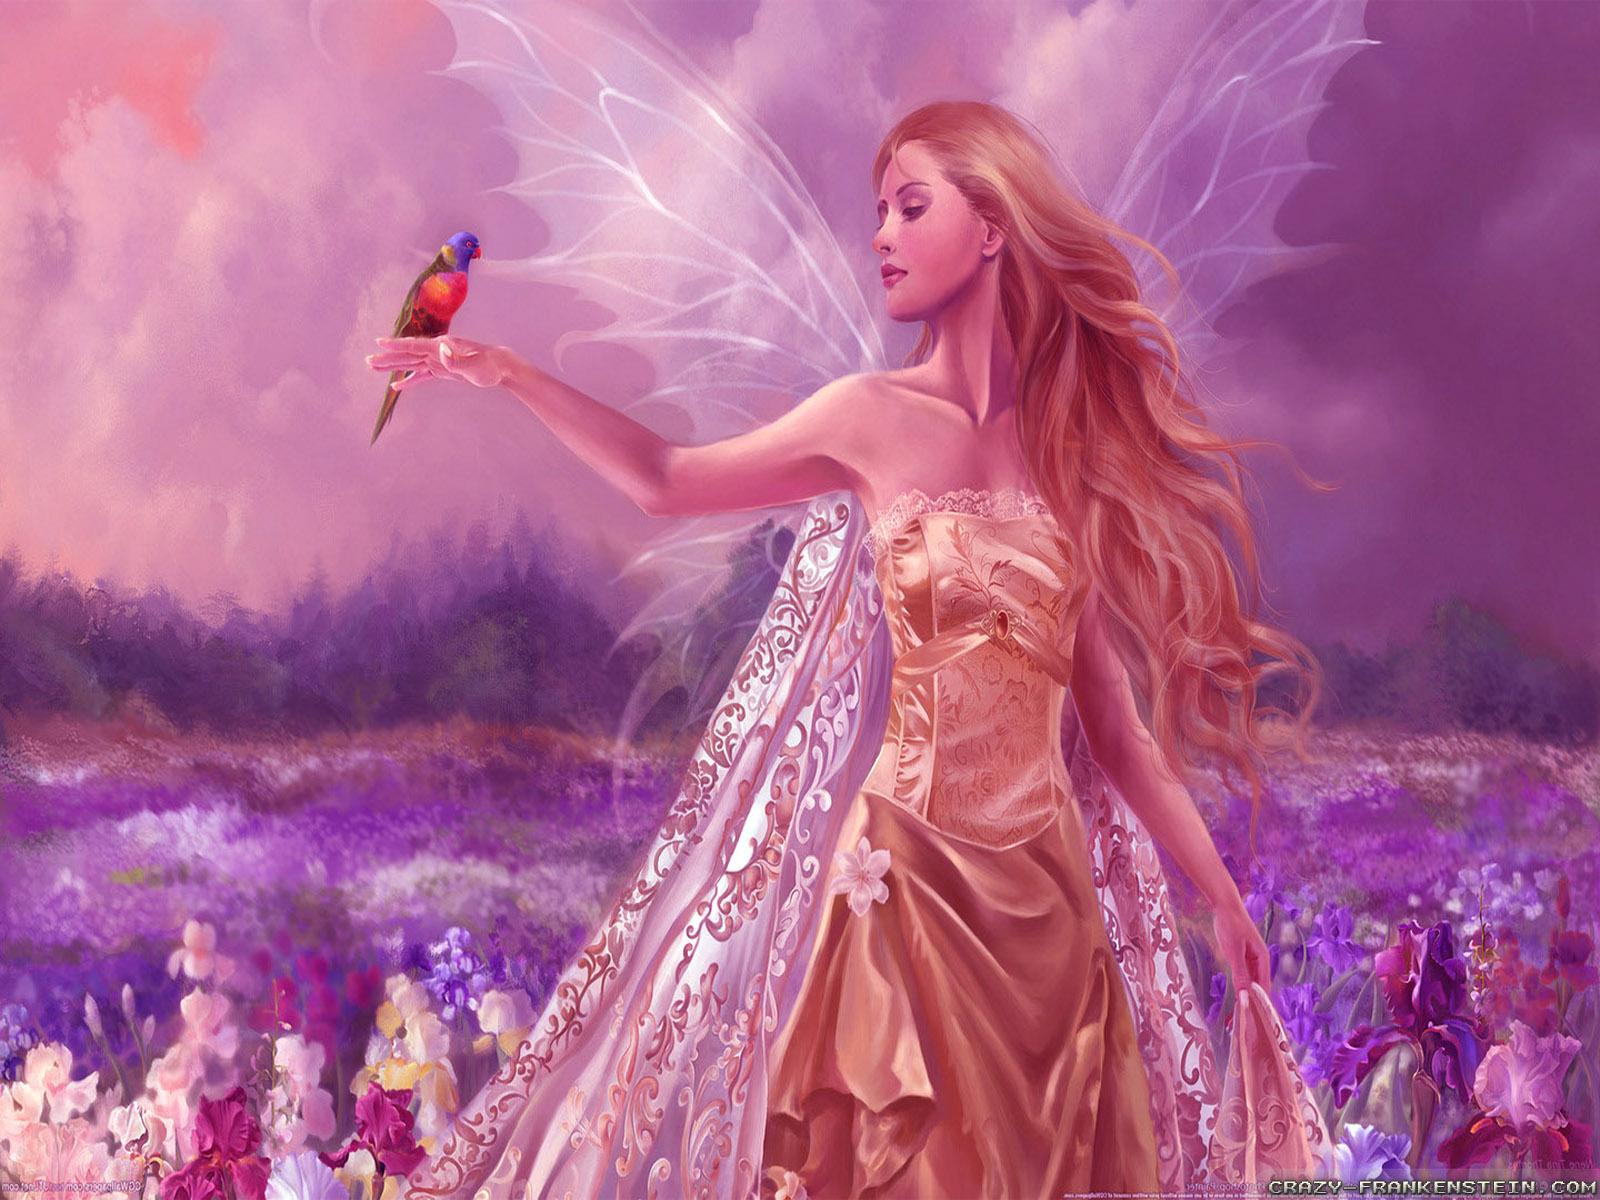 Jog Falls Wallpapers Desktop Beautiful Angel And Bird Animal Hd Wallpaper Widescreen